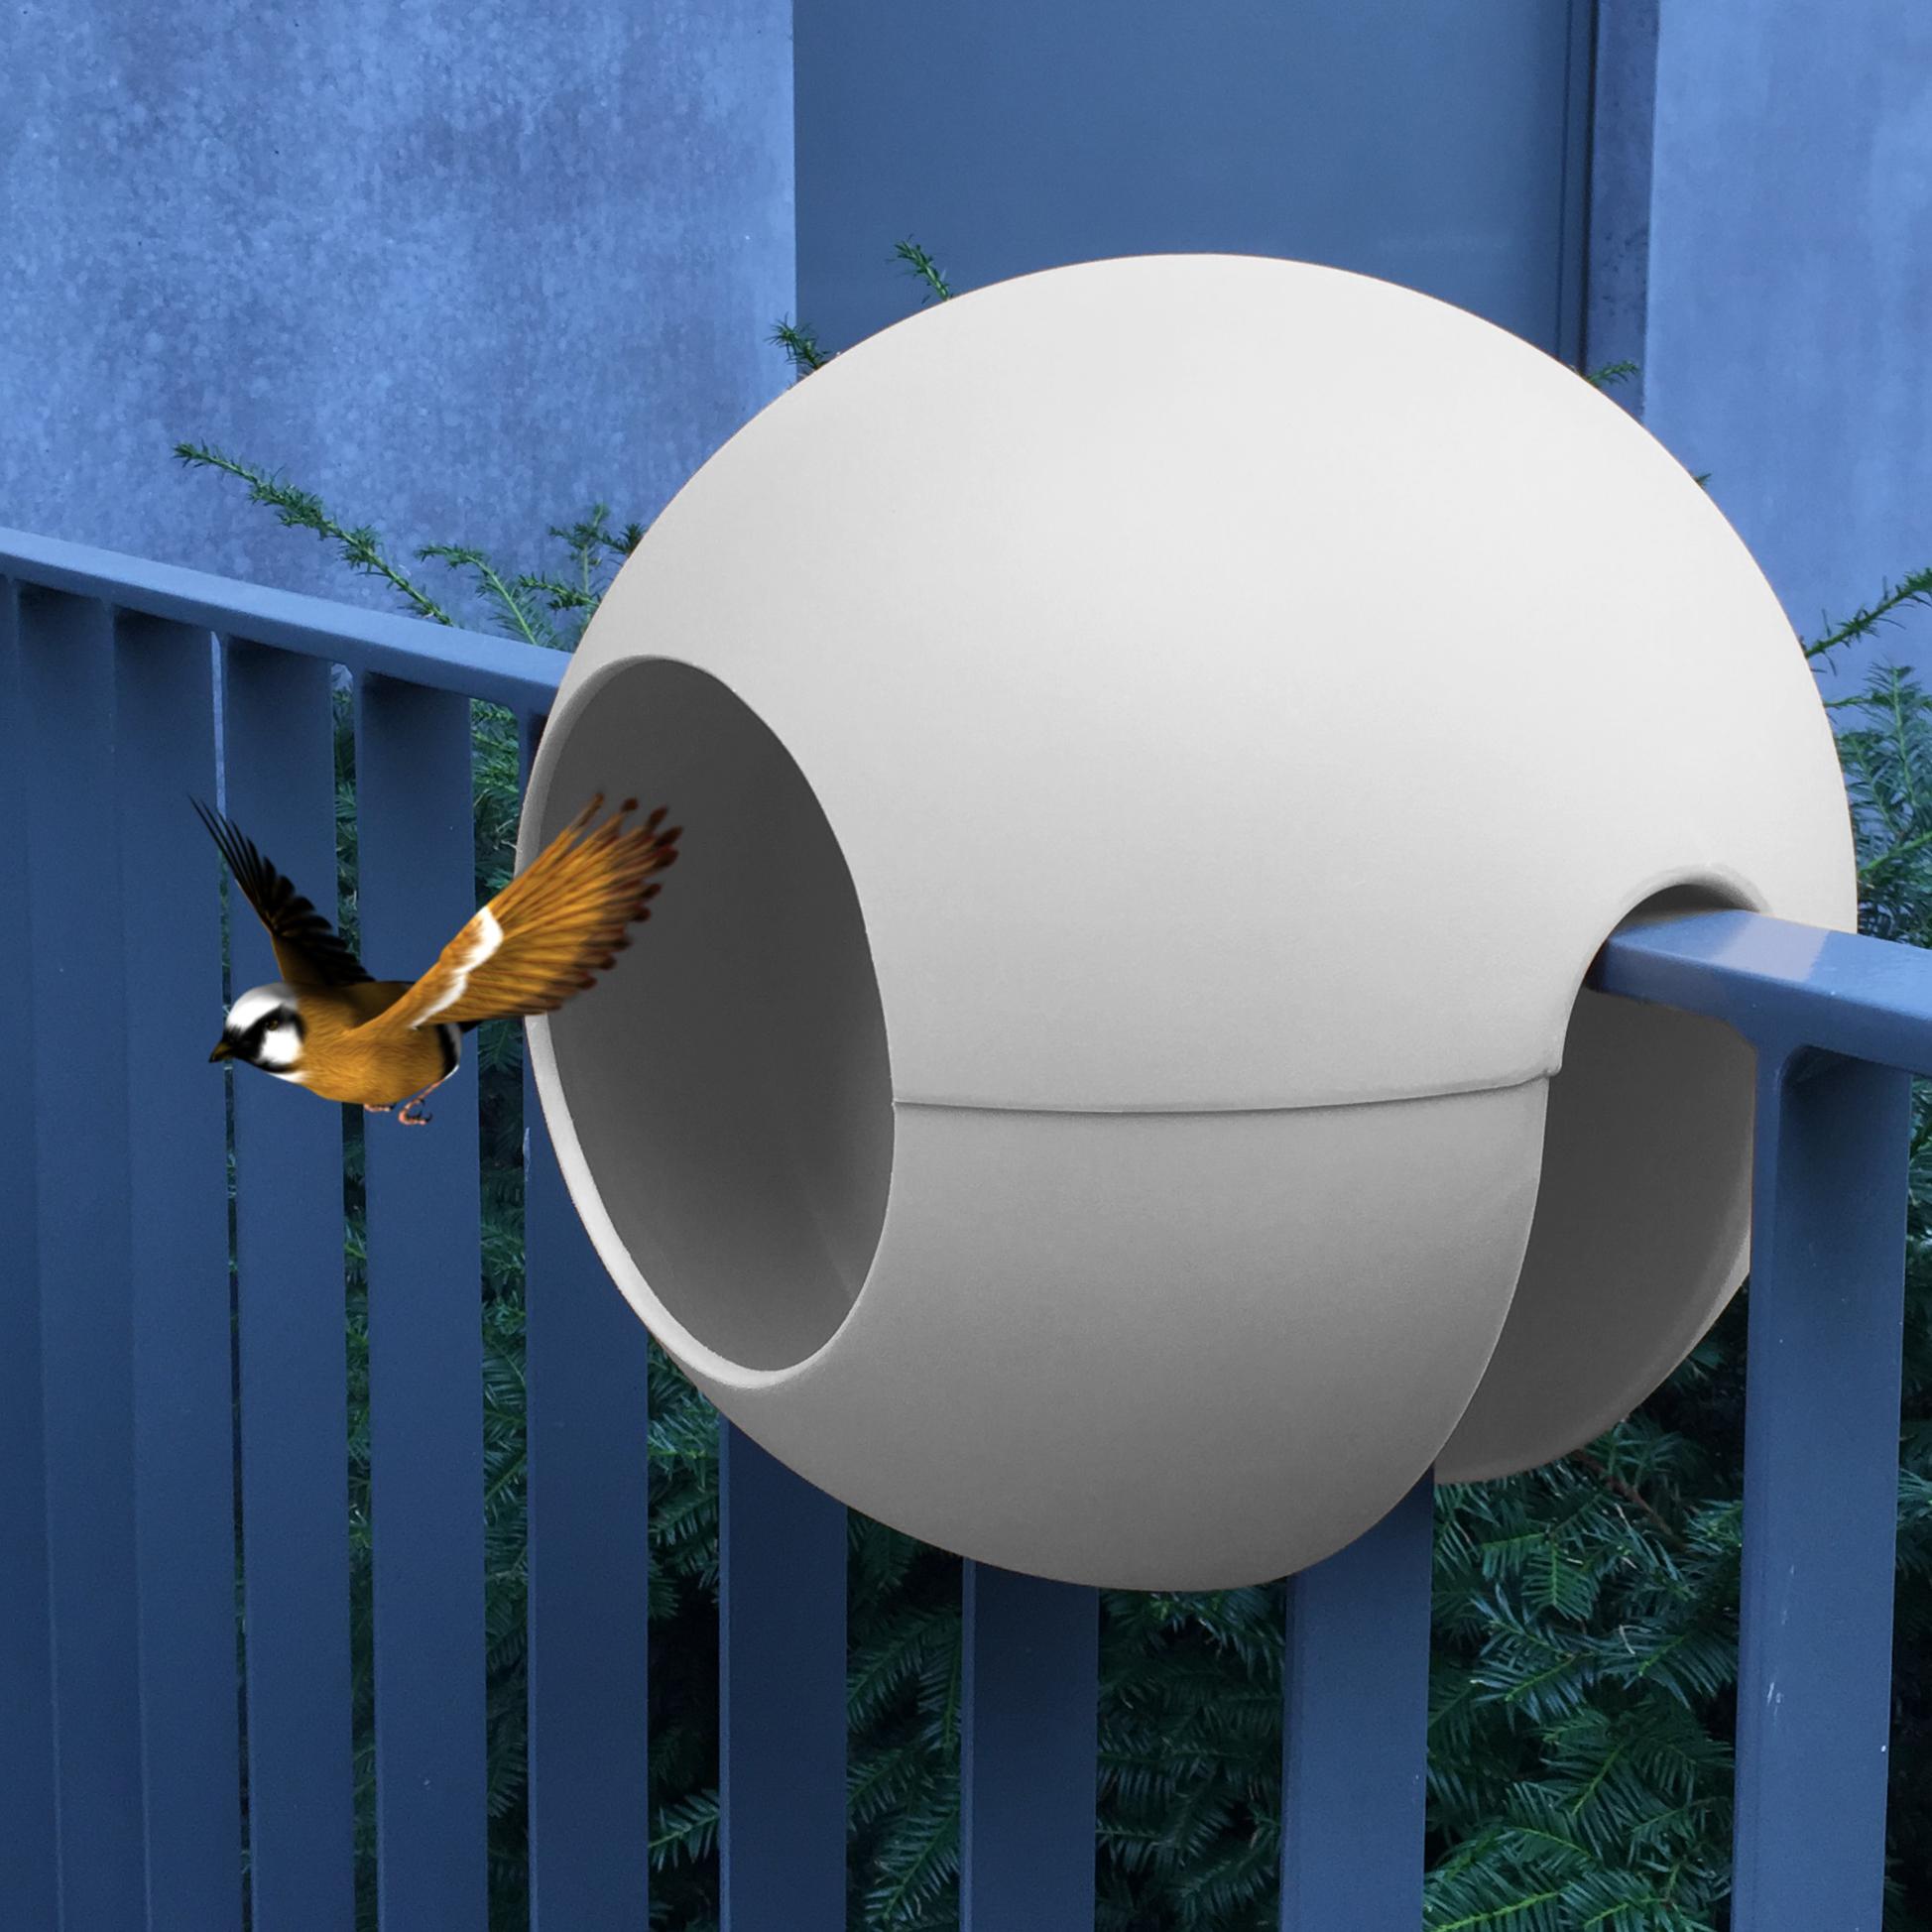 birdball balkon vogelh uschen design f r den balkon. Black Bedroom Furniture Sets. Home Design Ideas